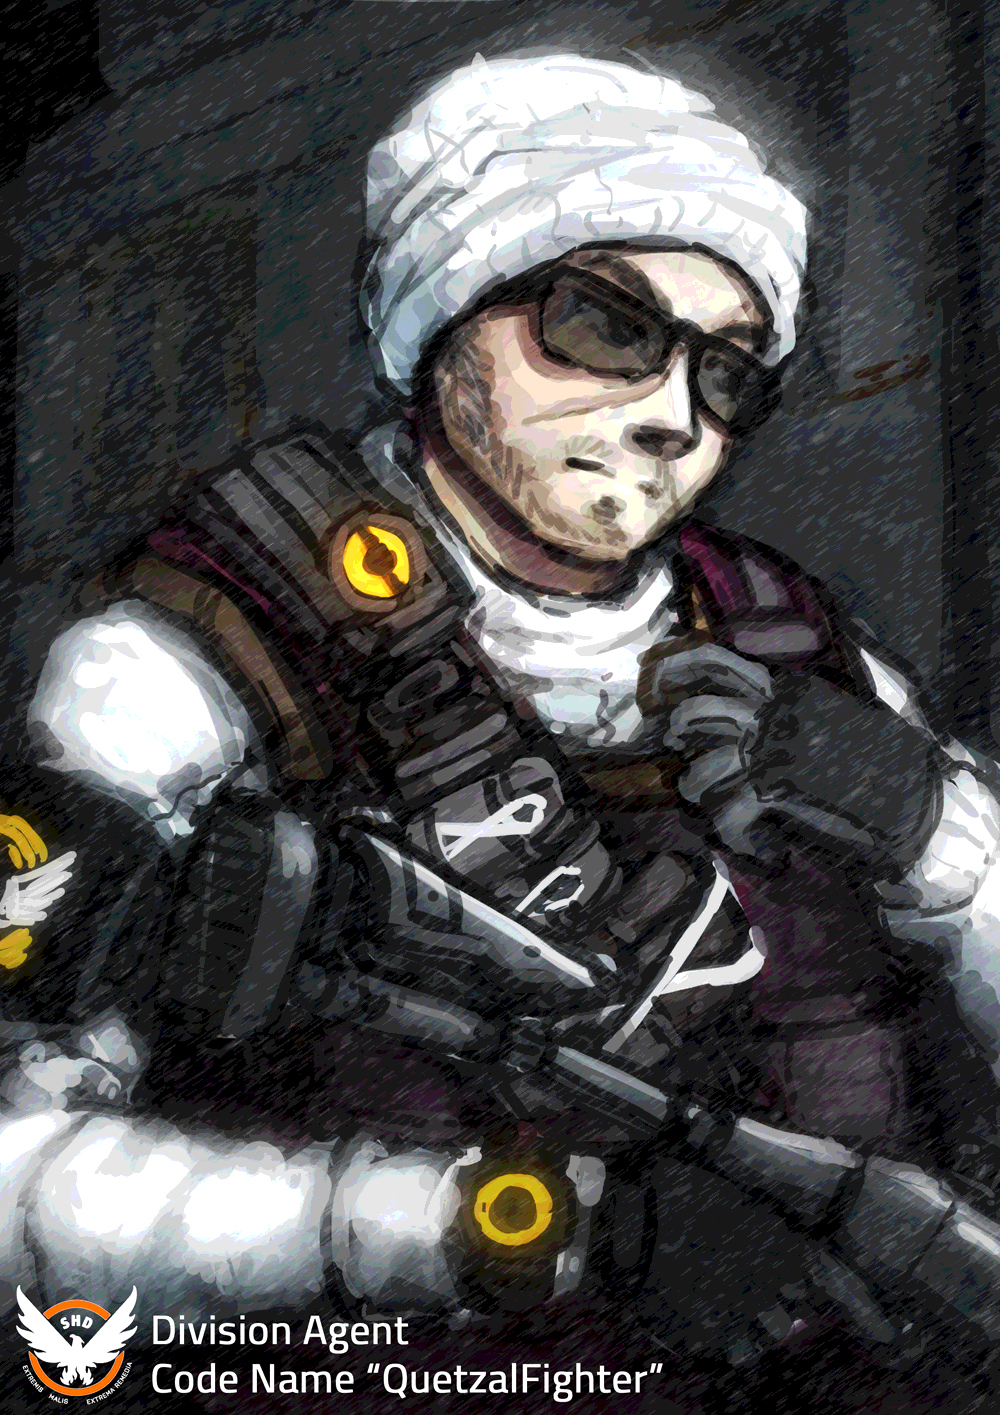 160420- Division Agent by Prafa-AR